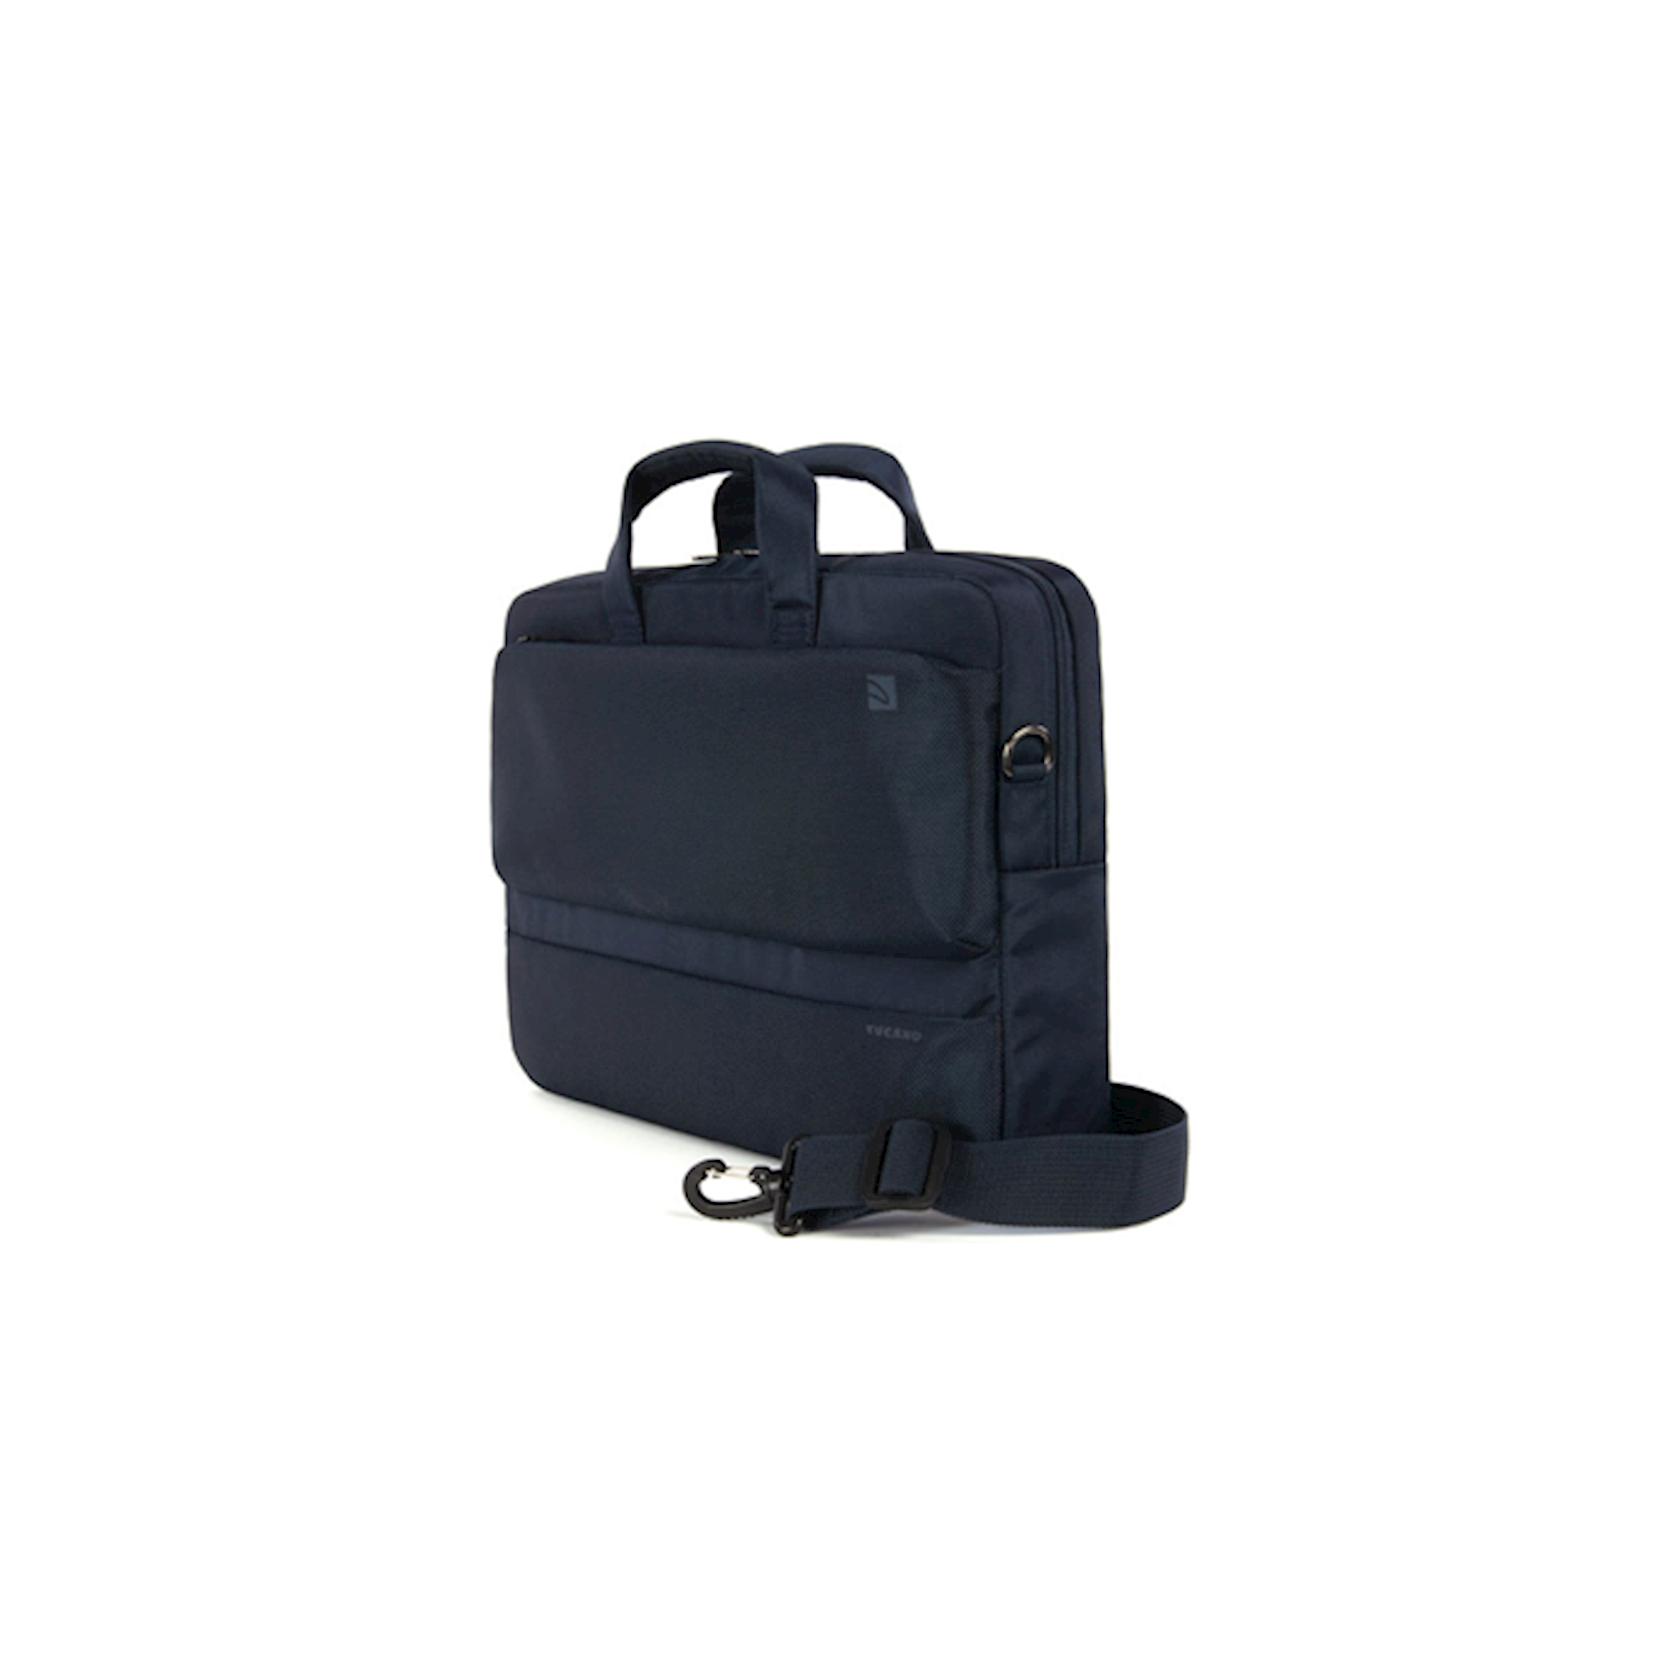 Noutbuk üçün çanta Dritta Slim Bag 15.6 Blue